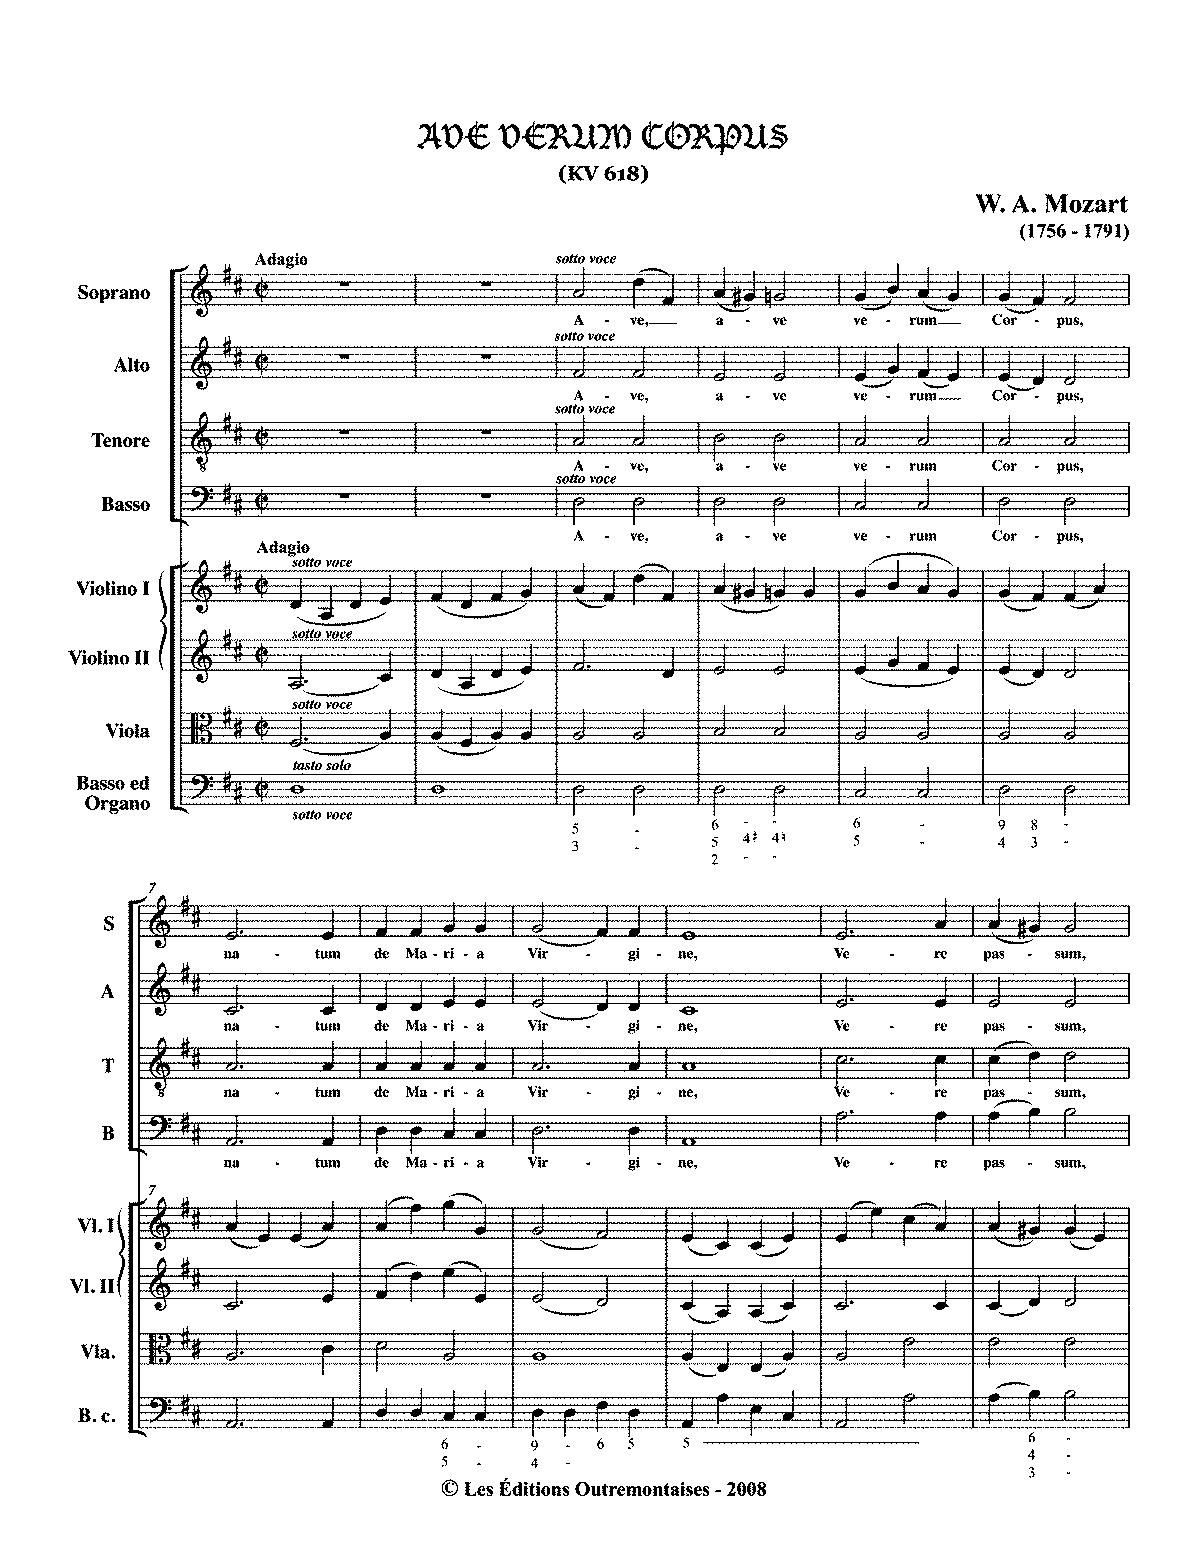 Ave Verum Corpus Text